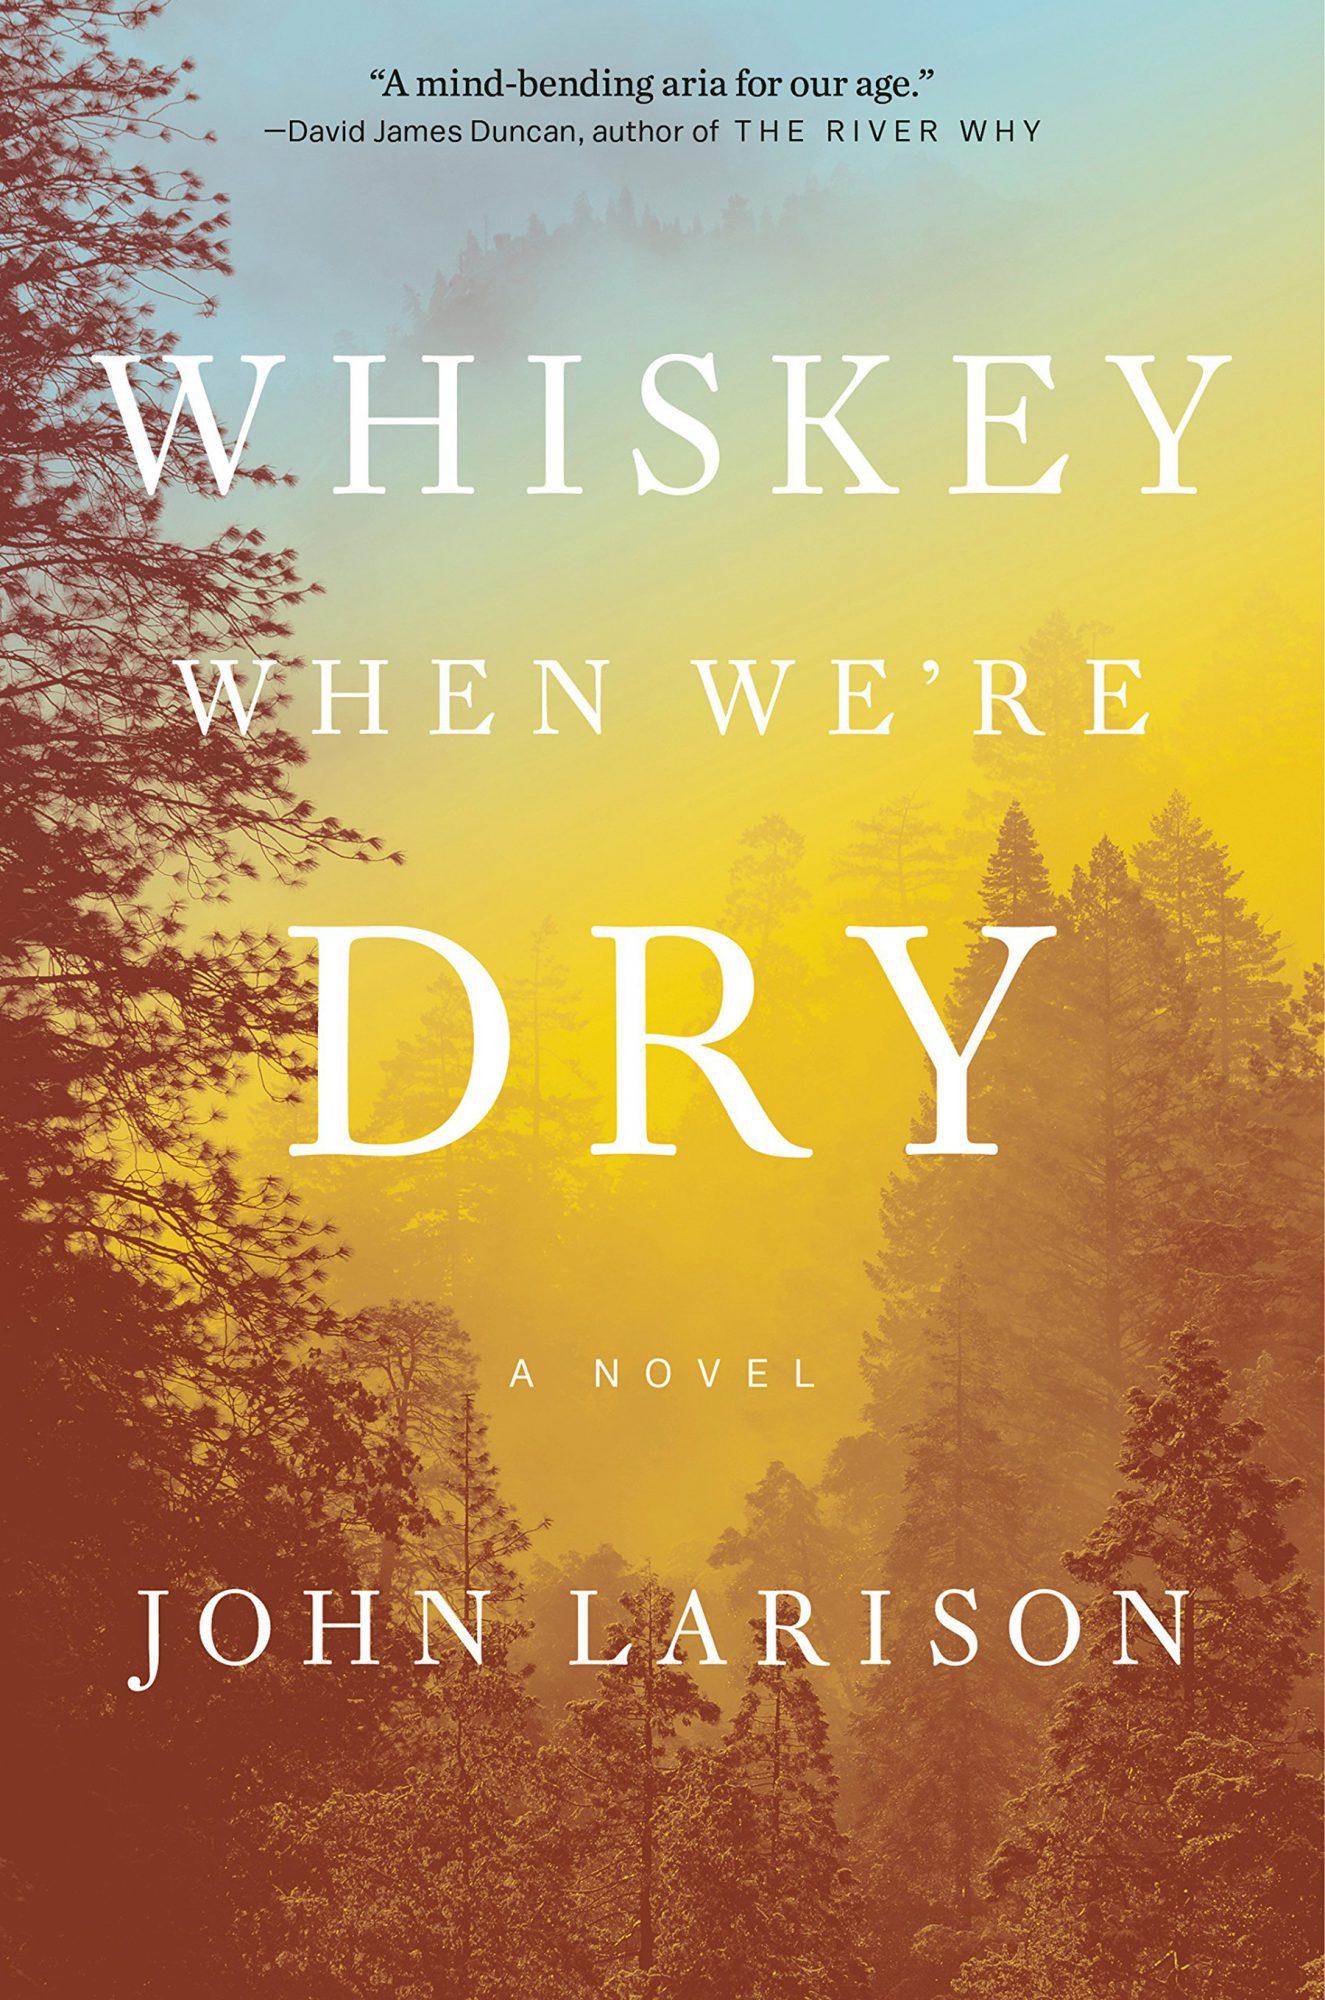 Whiskey When We're Dry  by John Larison Viking